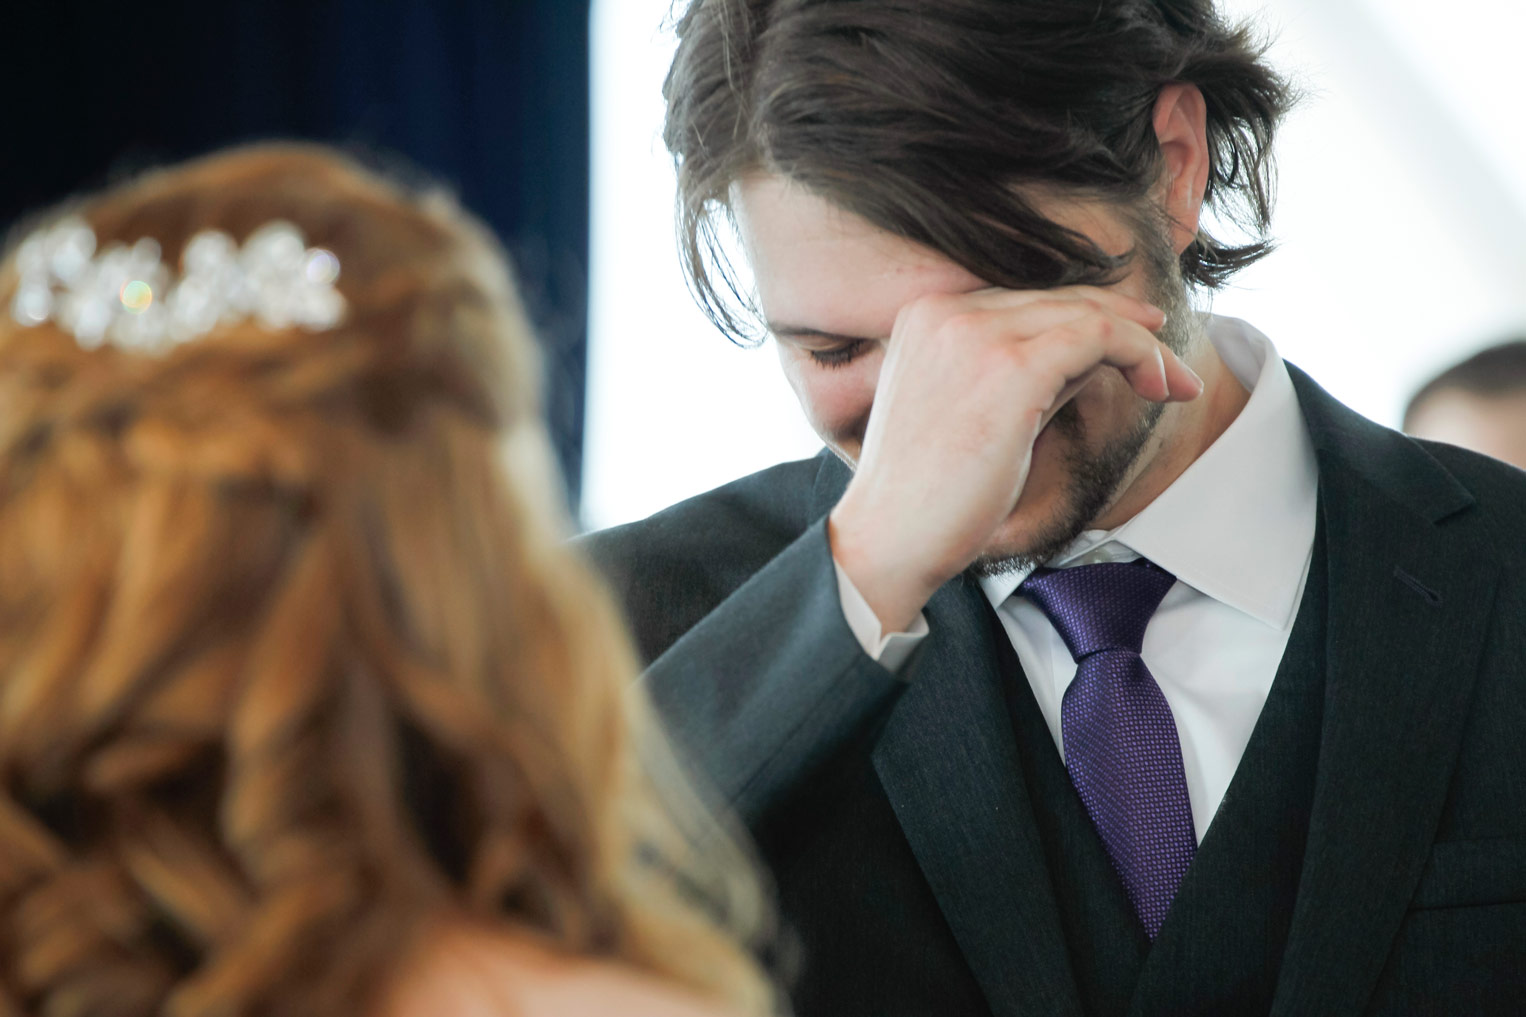 milwaukee-discovery-world-pier-wisconsin-wedding-ruthie-hauge-photography-28.jpg